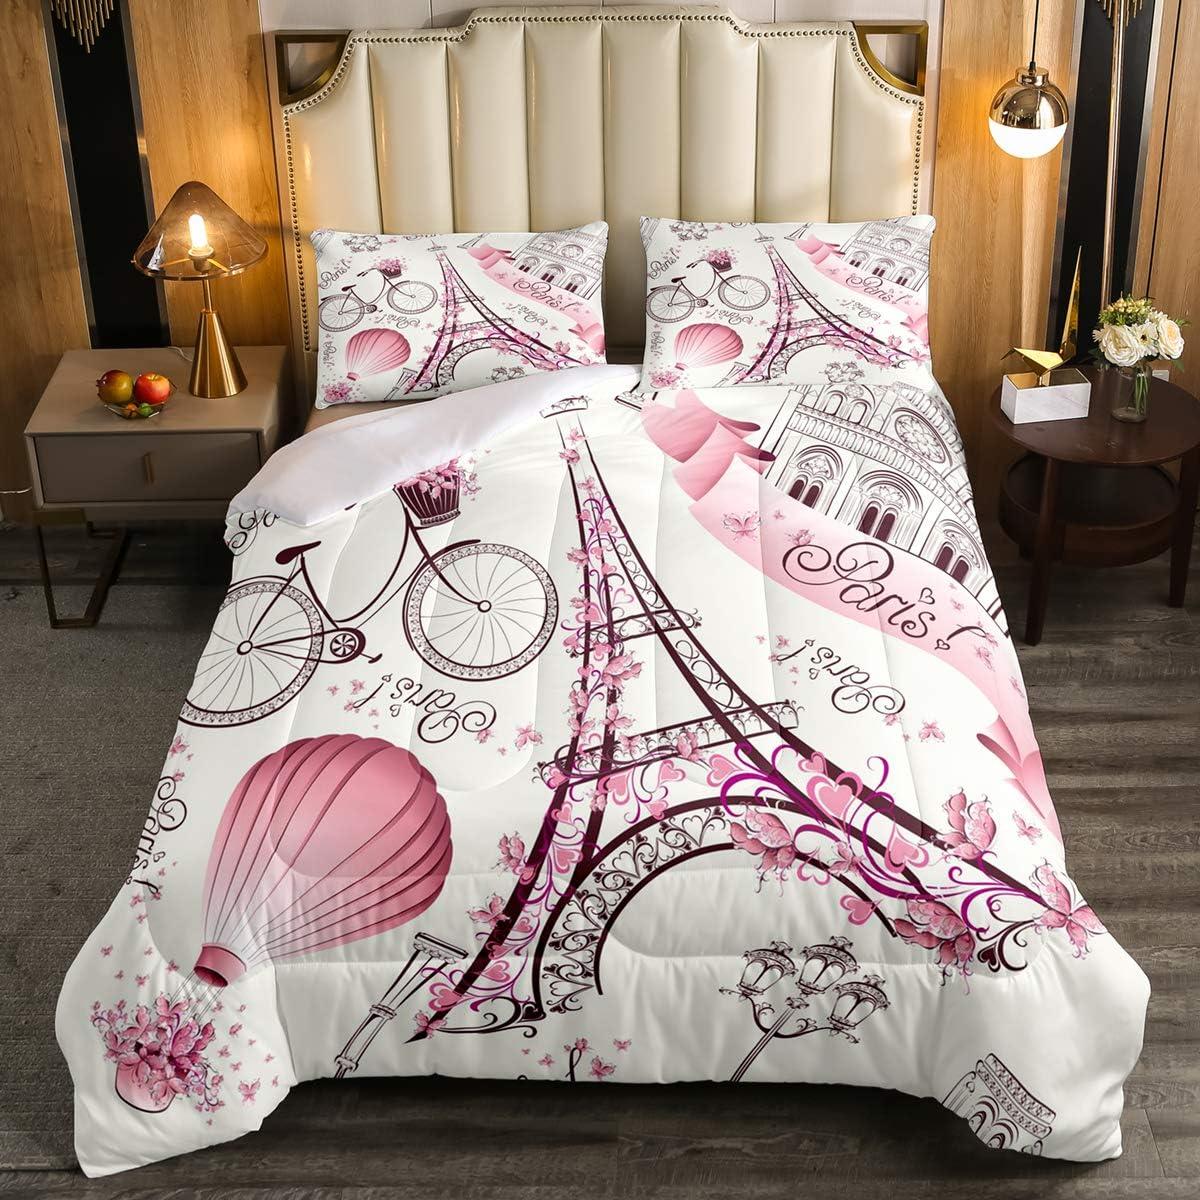 Eiffel Tower Couple Comforter Set Full Size Pink Floral Decor Down Comforter,Romantic Theme Decor Girls Adult Women Couple Quilted Duvet Paris Cityscape Printed Stylish Simple Soft Bedding Comforters